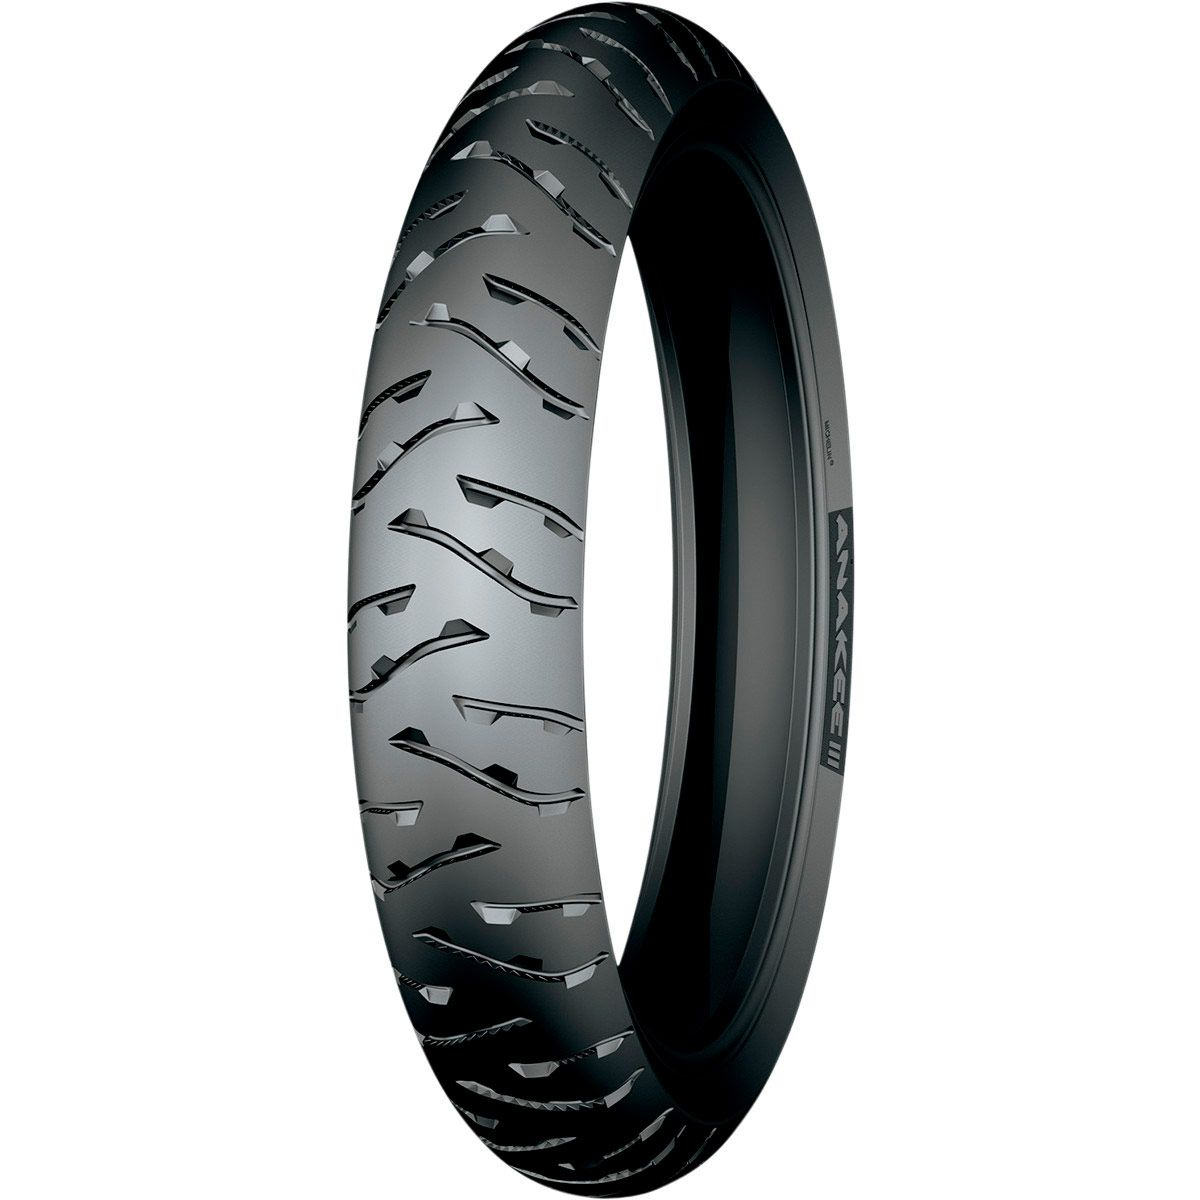 Pneu Diant Michelin 110-80-19 Anakee 3 59v 004703